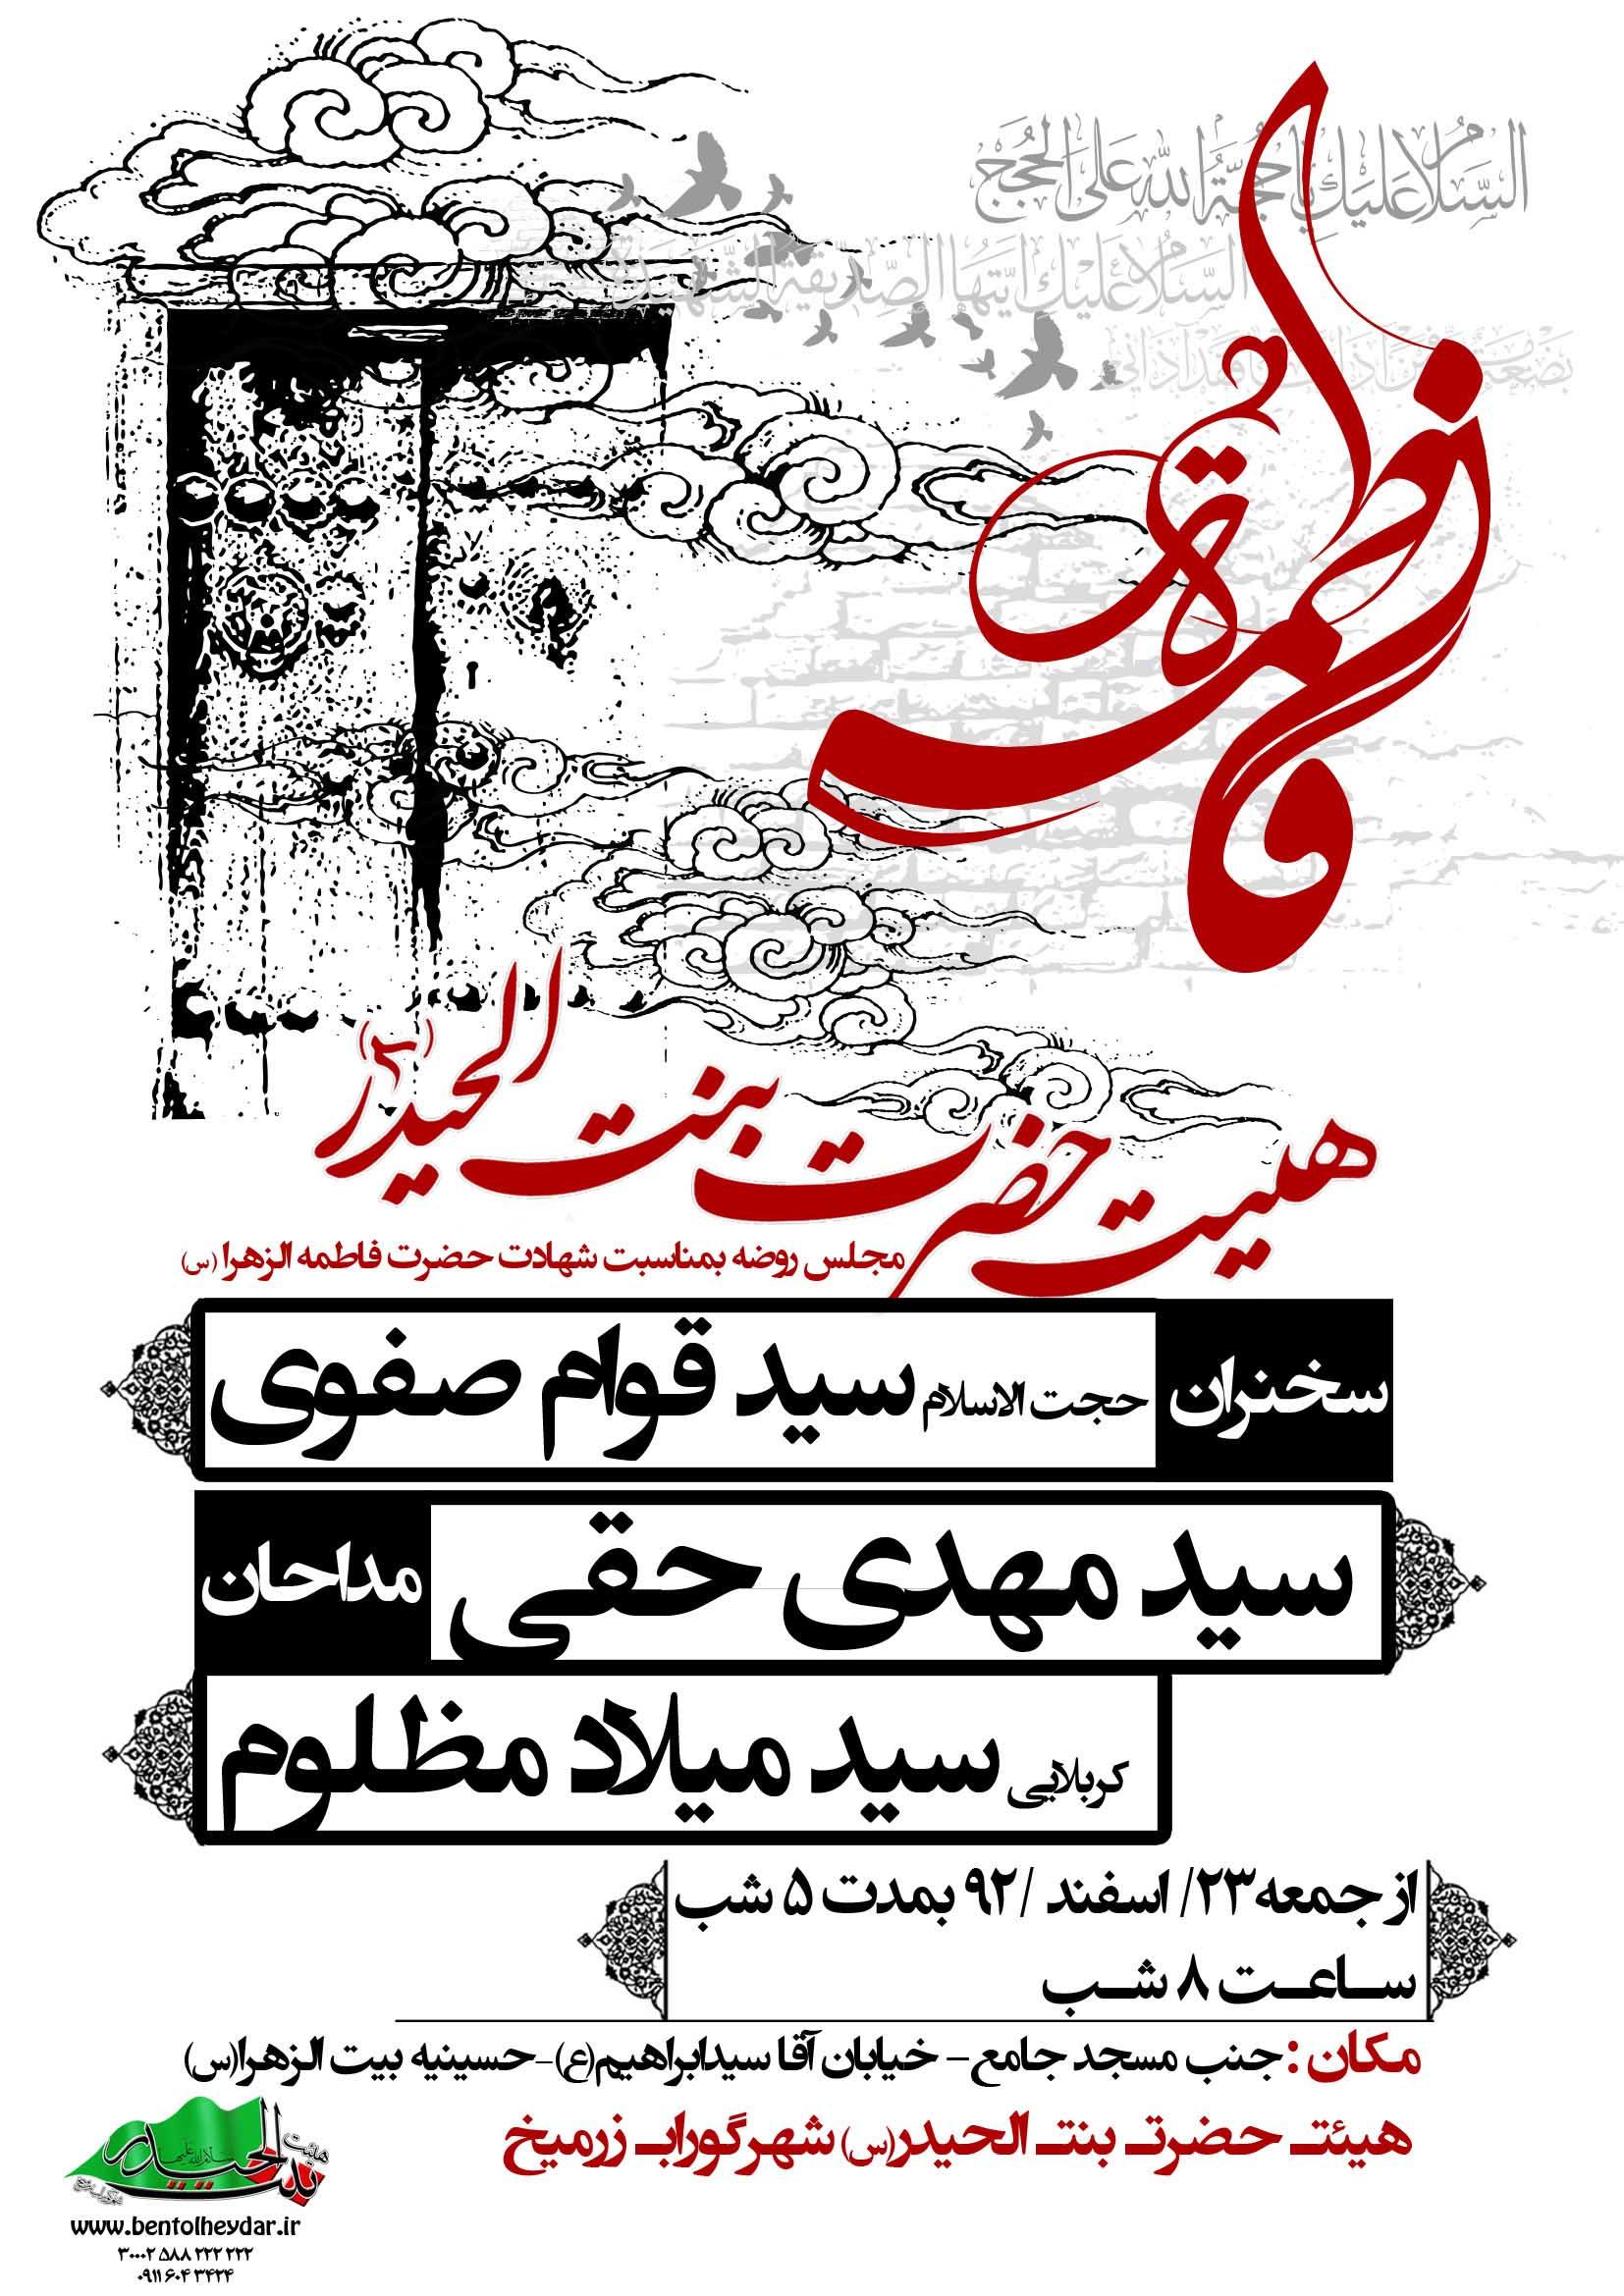 اطلاعیه : جلسه دهه اول فاطمیه 92 هیئت حضرت بنت الحیدر(س)